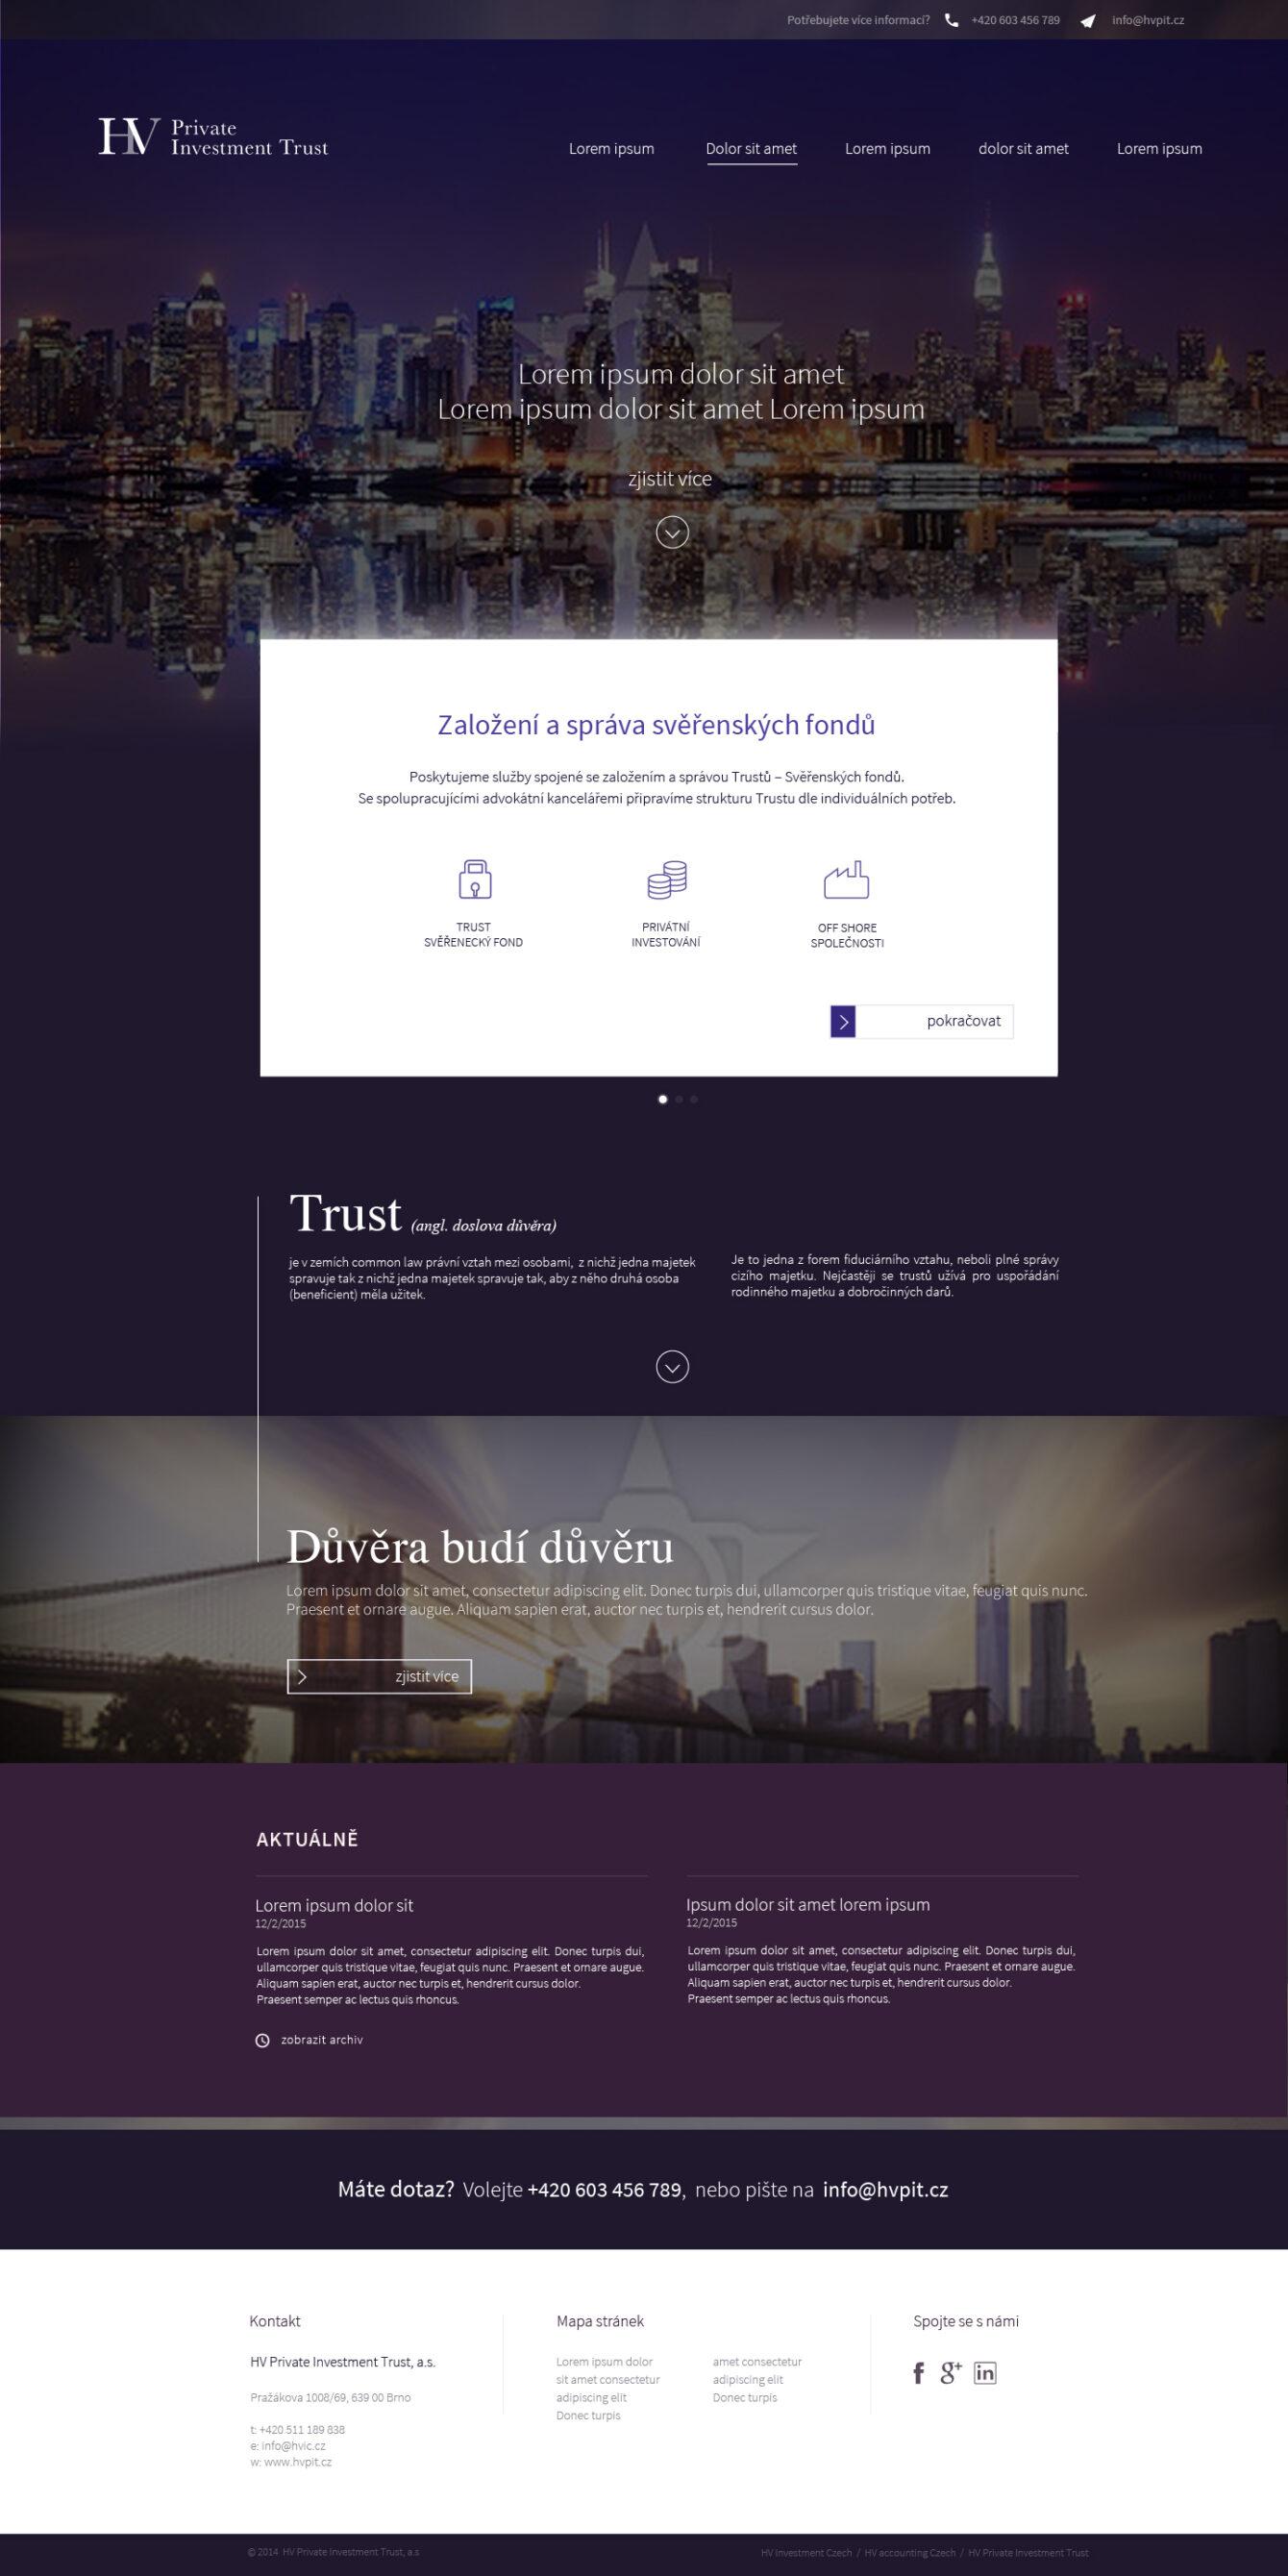 Tvorba webu HV Investment Brno